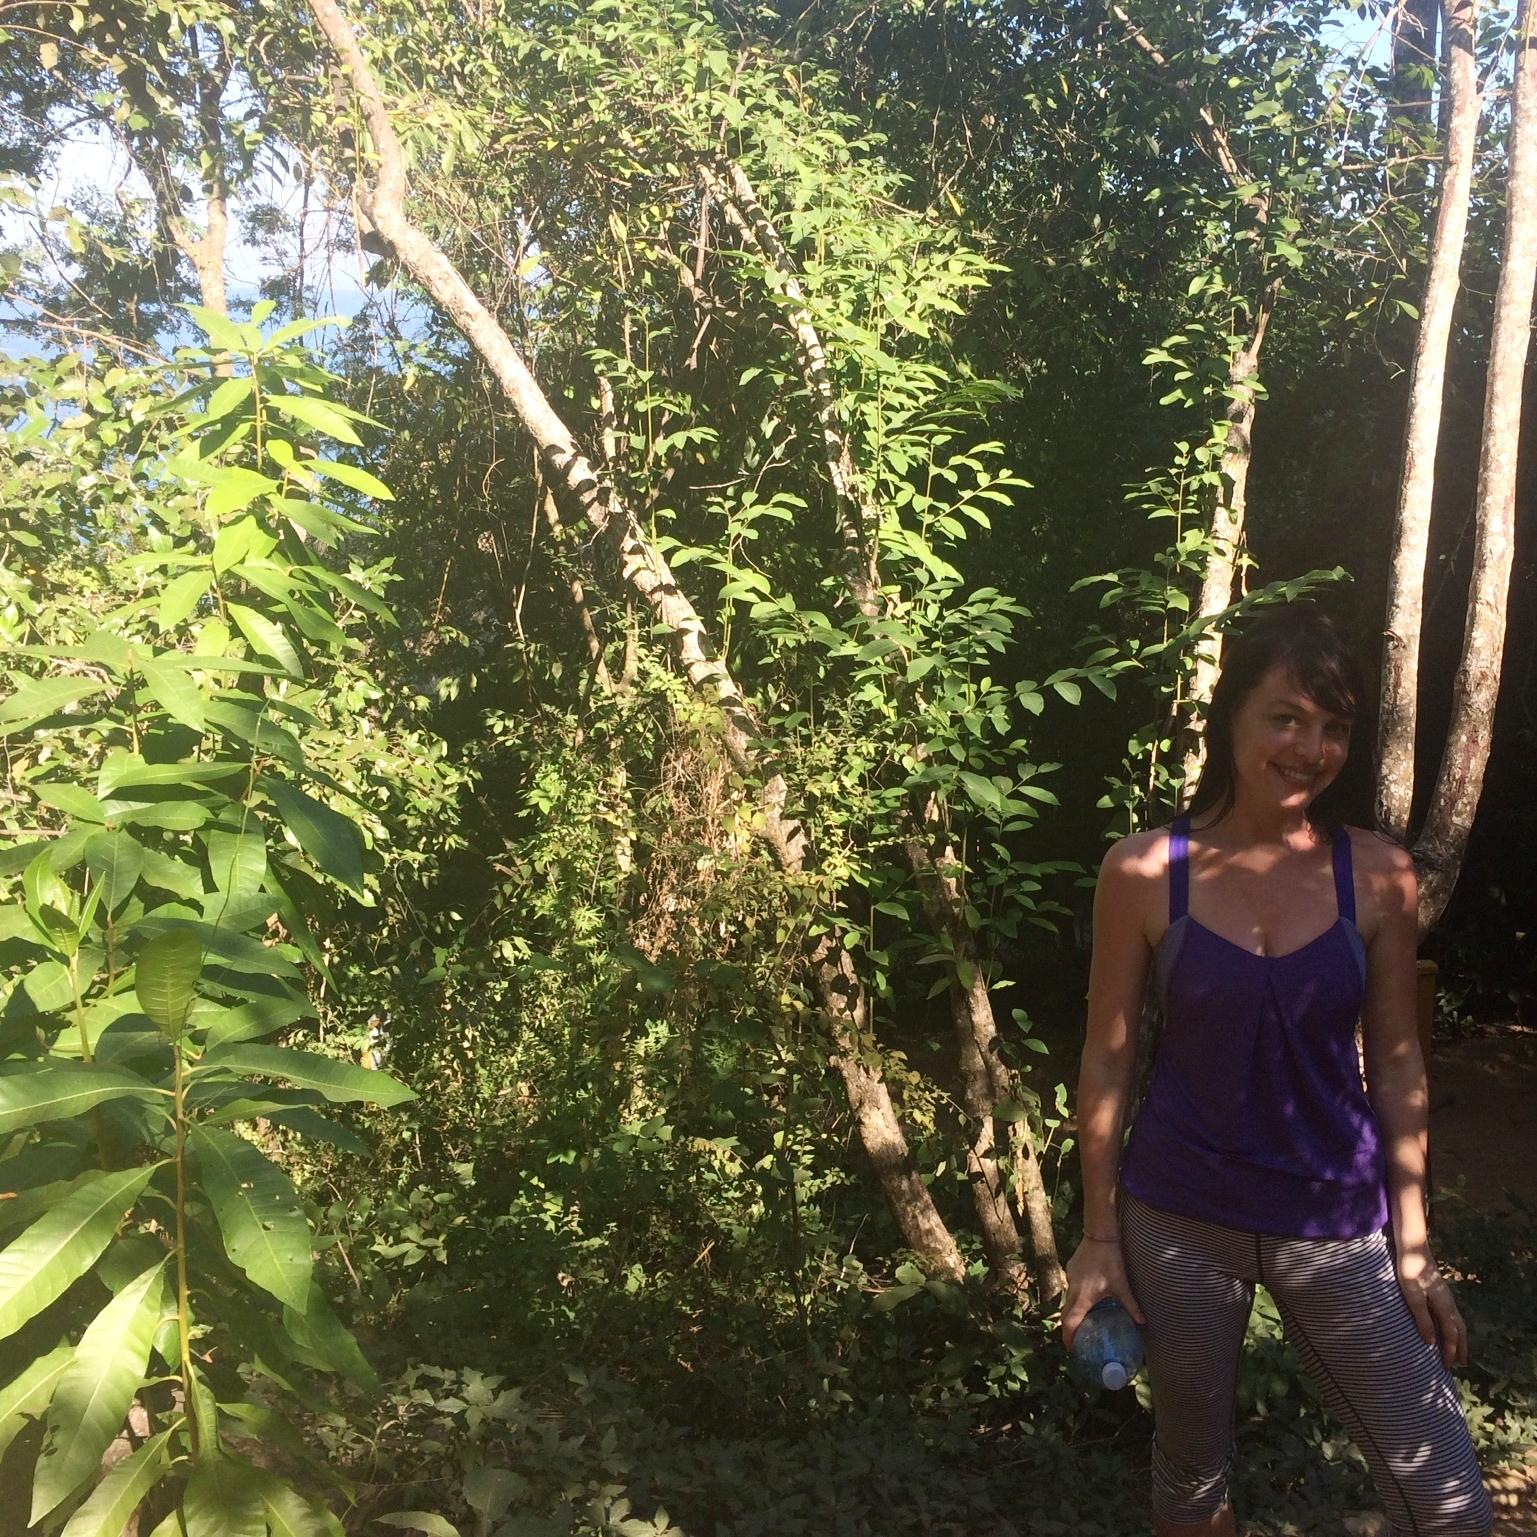 Colleen enjoying the nature walk on property at Xinalani